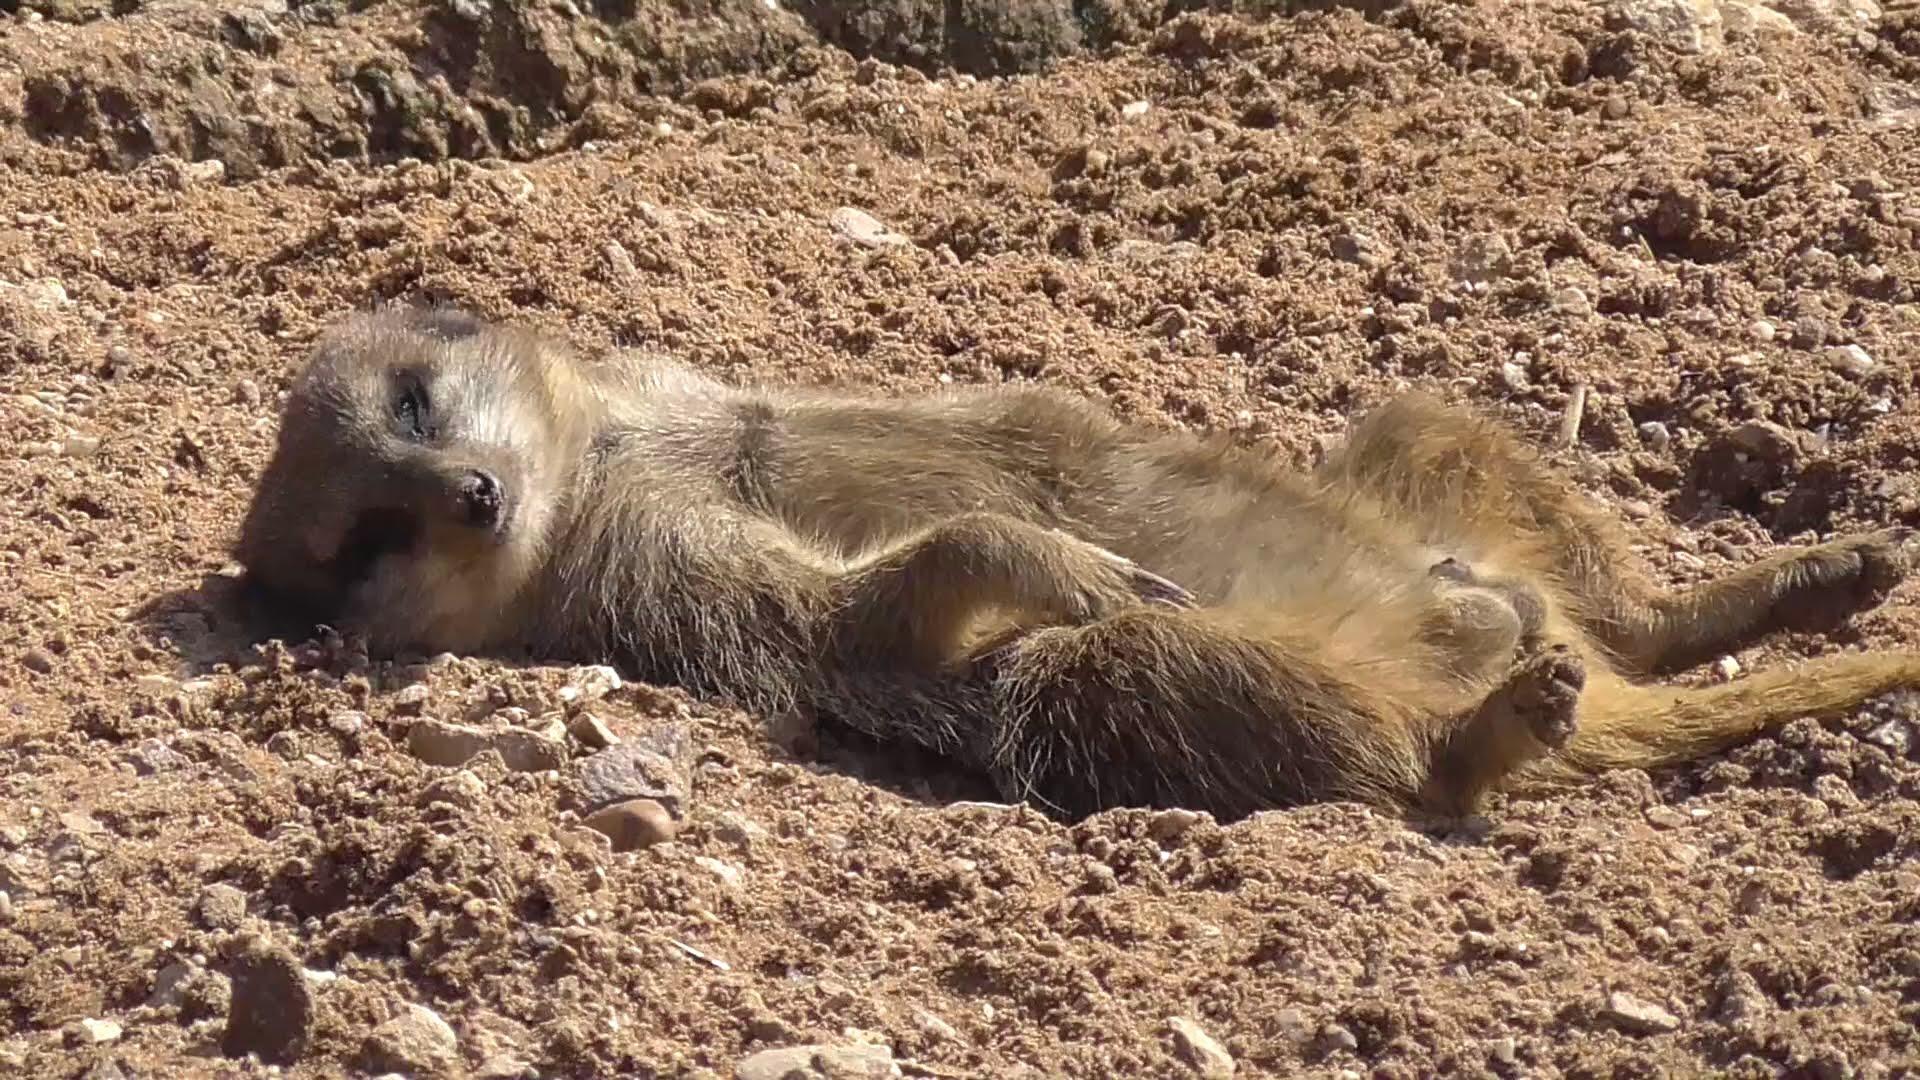 Sunbathing meerkats photo